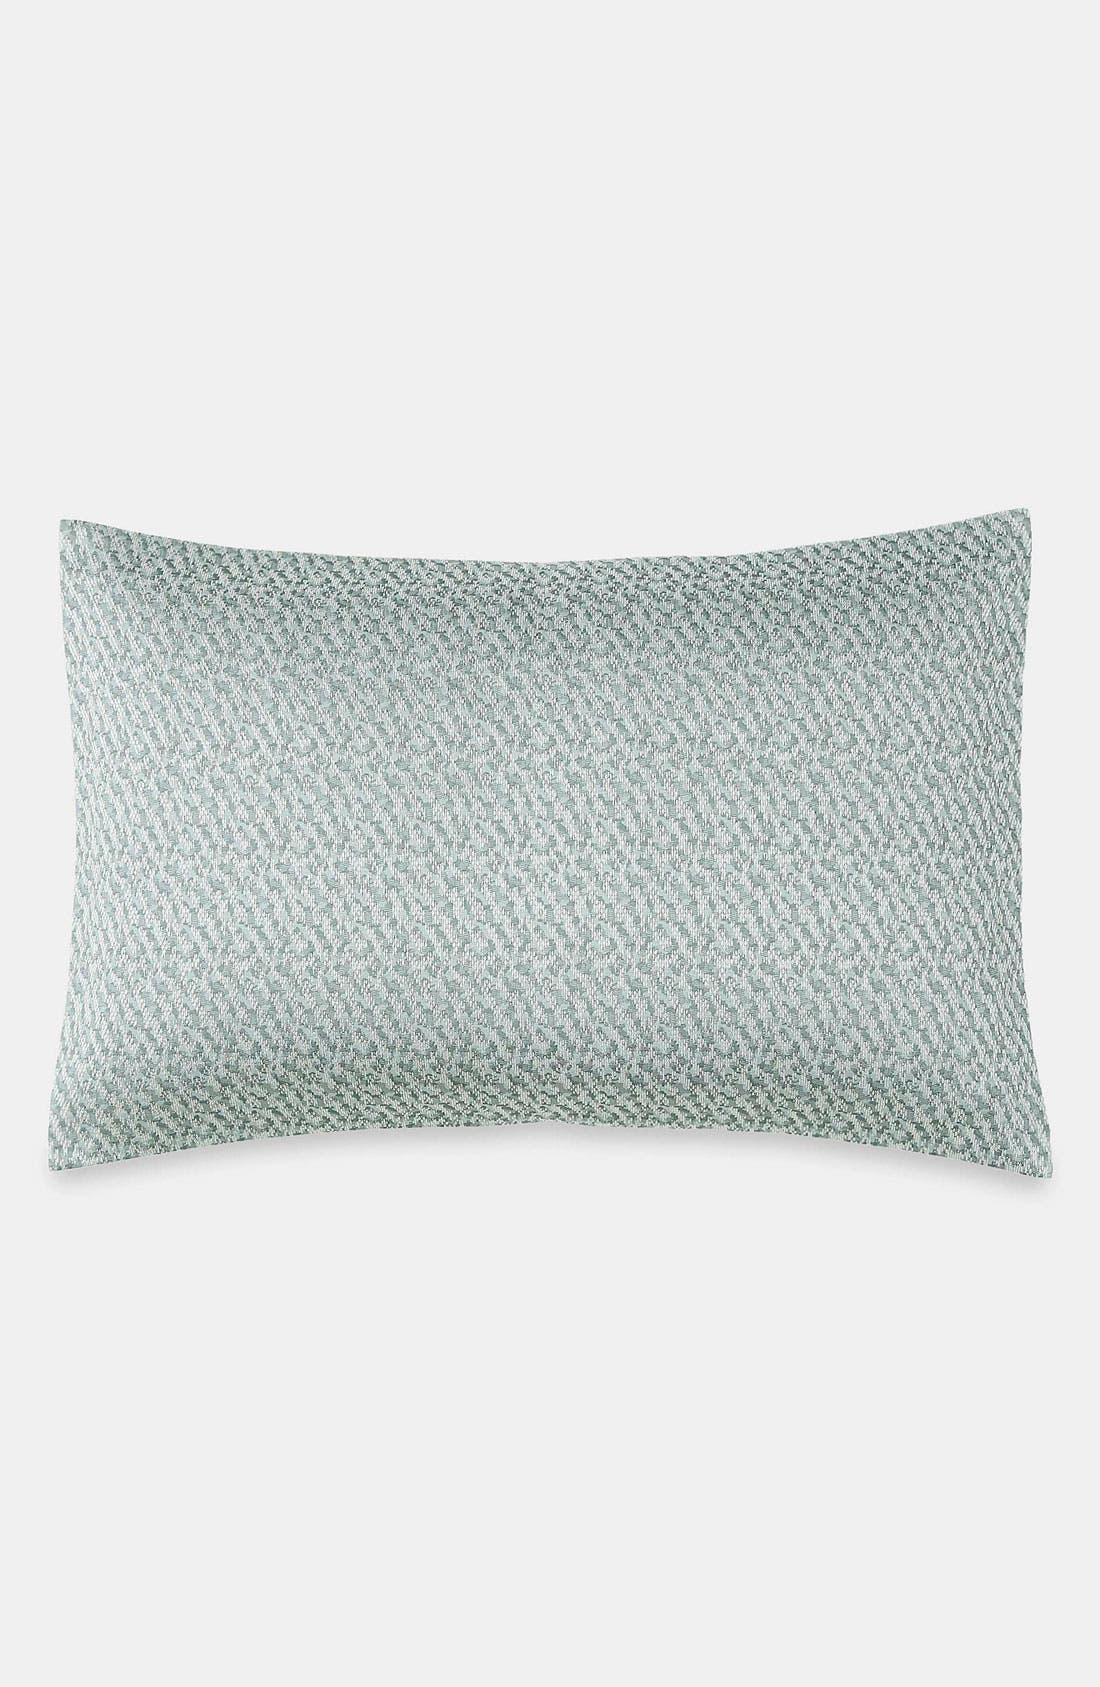 Alternate Image 1 Selected - DKNY 'Urban Space' Jacquard Pillow Sham